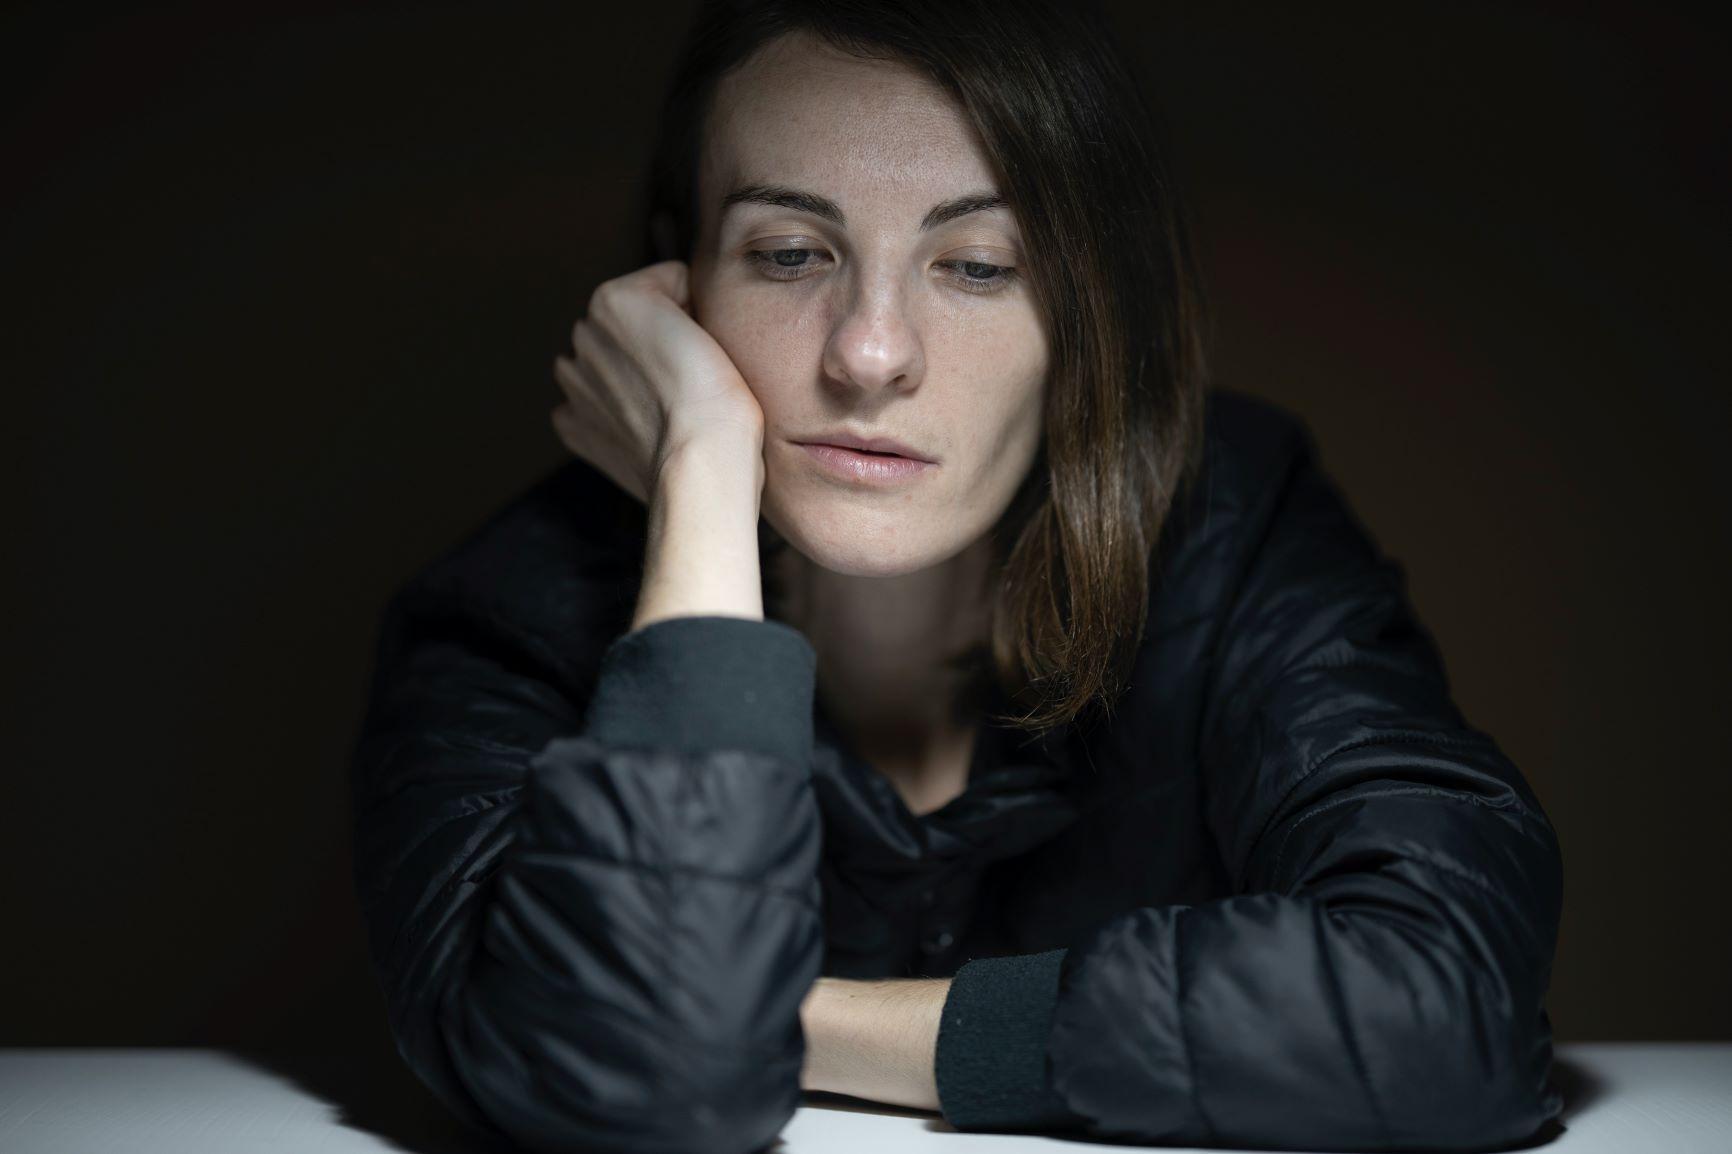 woman-in-black-jacket-by Engin-Akyurt - capacidad de sentirse vulnerable